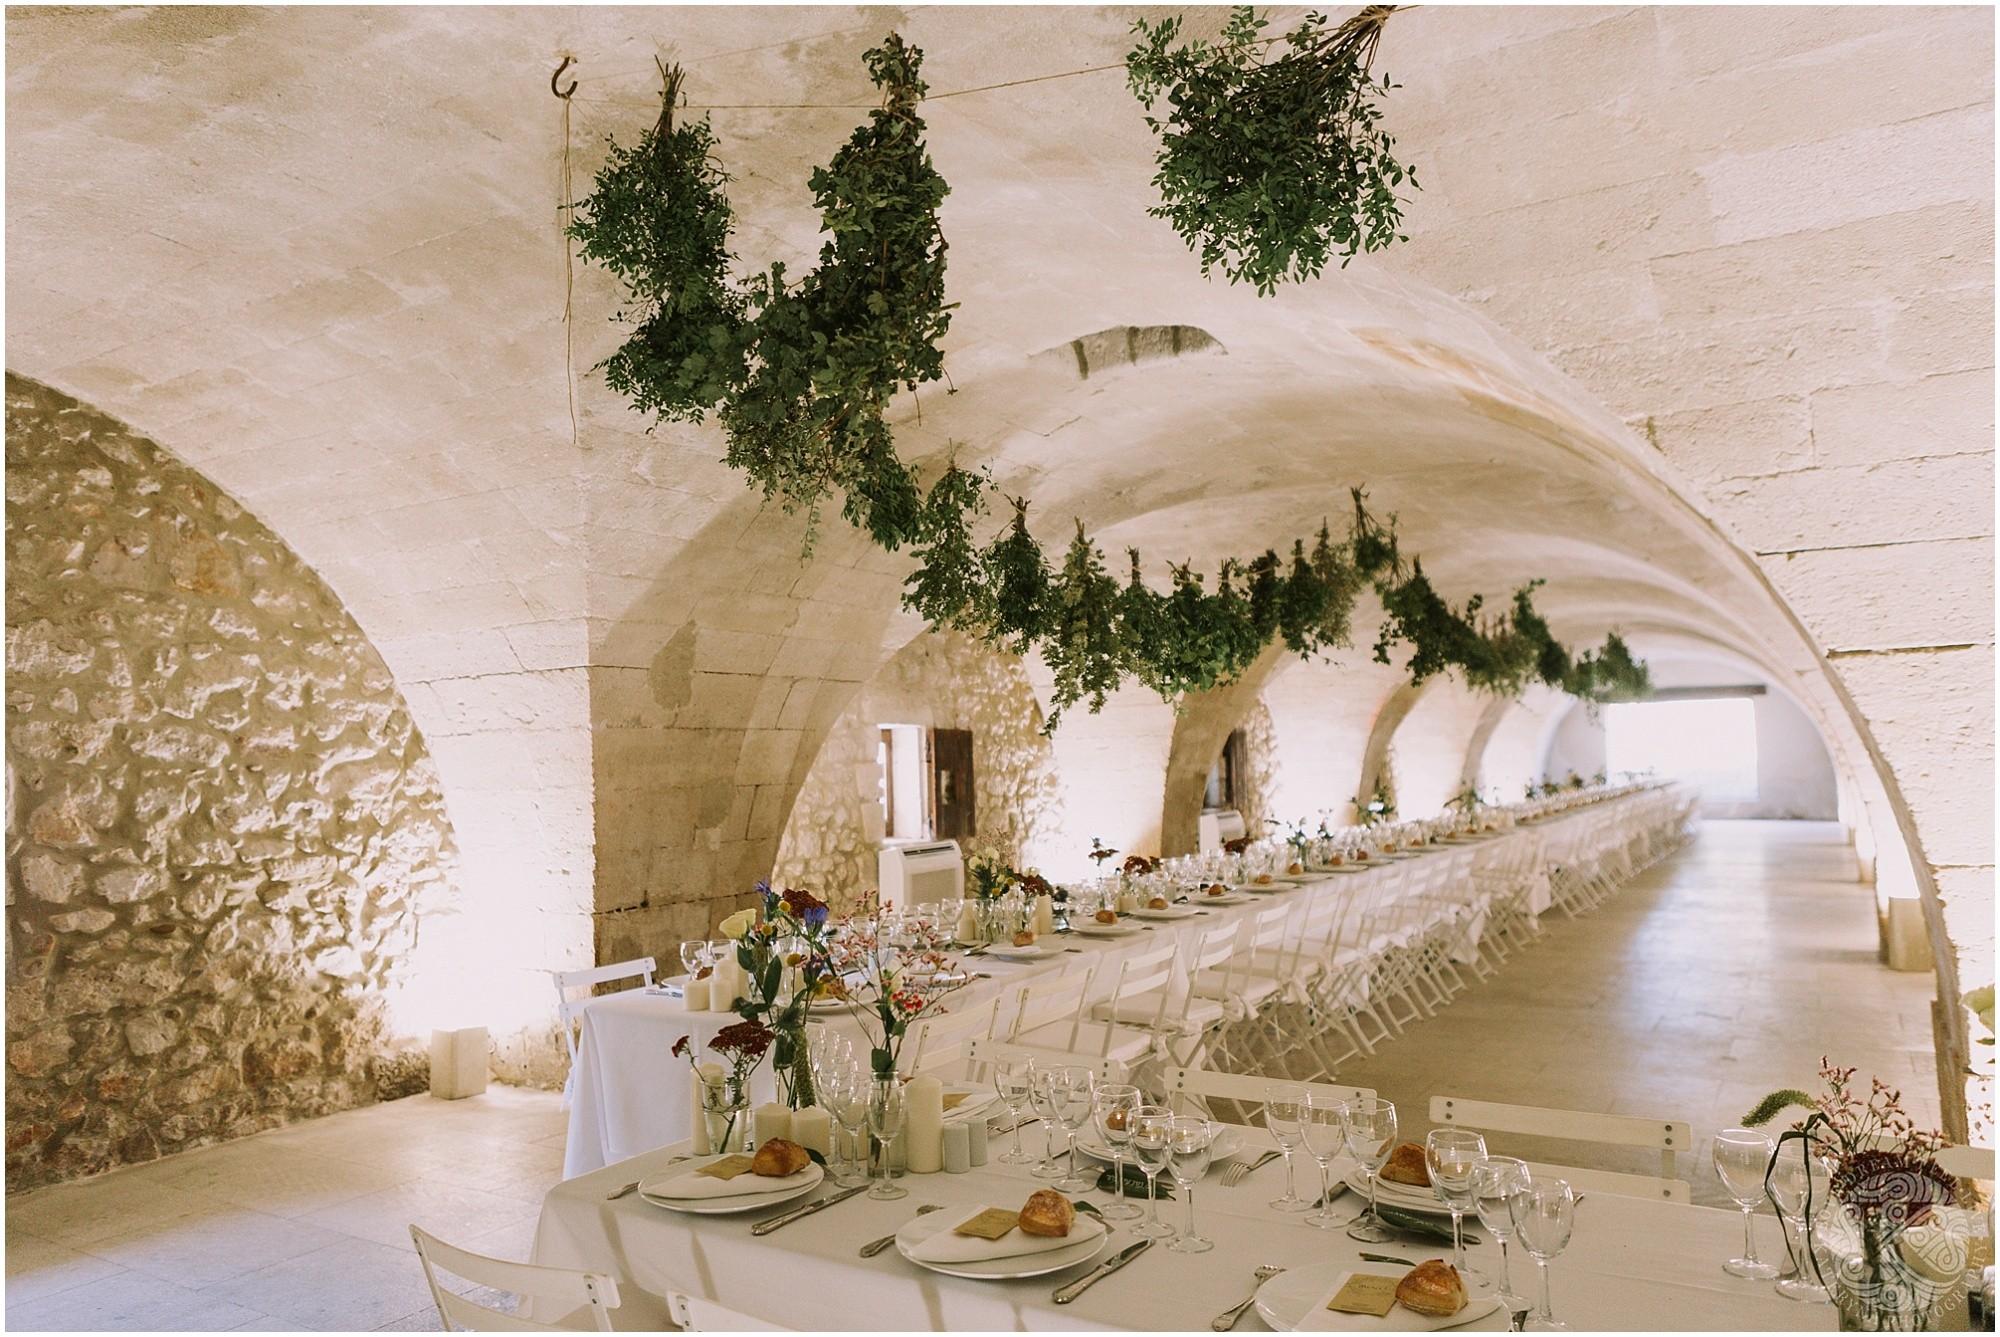 Kateryna-photos-photographe-mariage-vaucluse-provence-avignon-ferme-st-hugues_0059.jpg